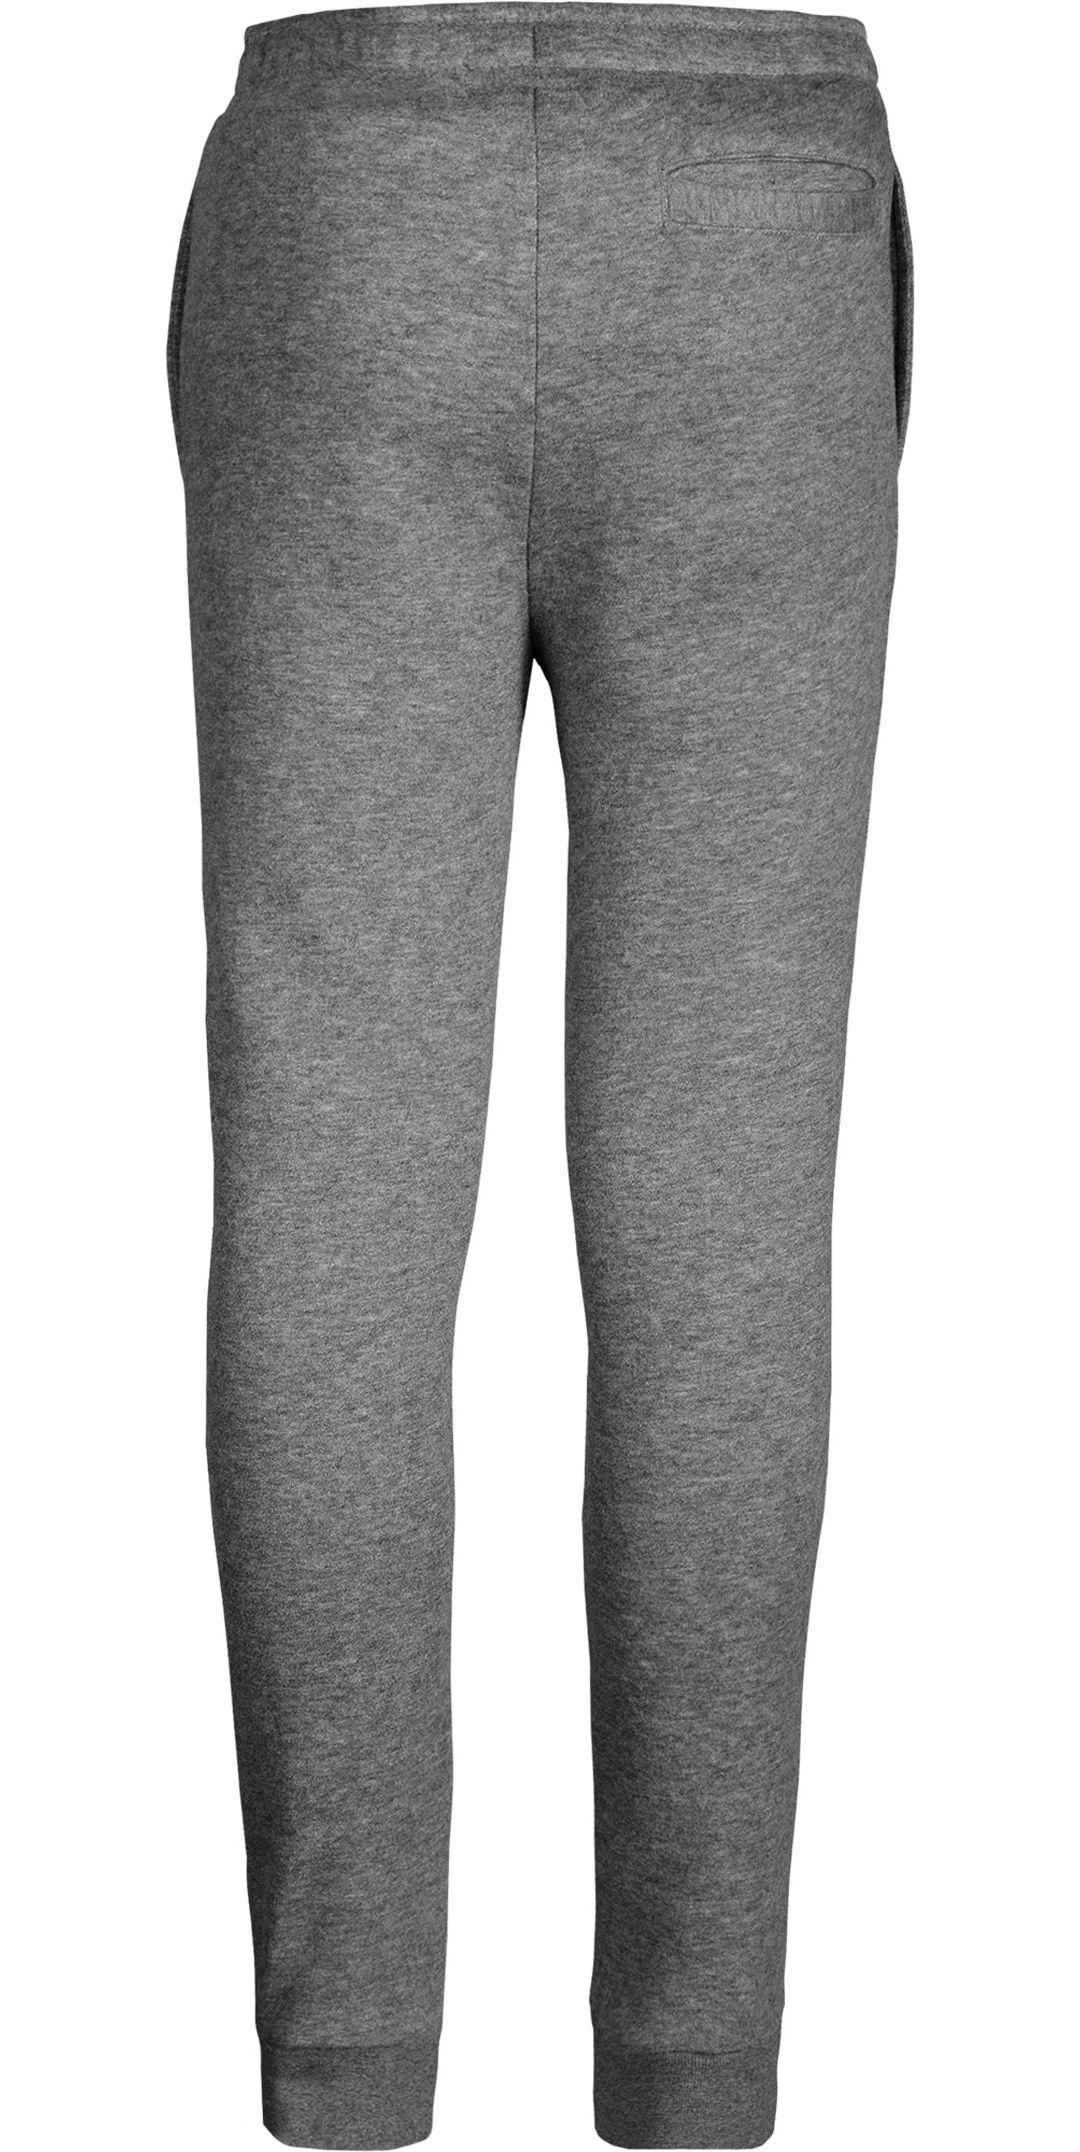 1191f1e2f20 Jordan Boys' Jumpman Fleece Pants | DICK'S Sporting Goods